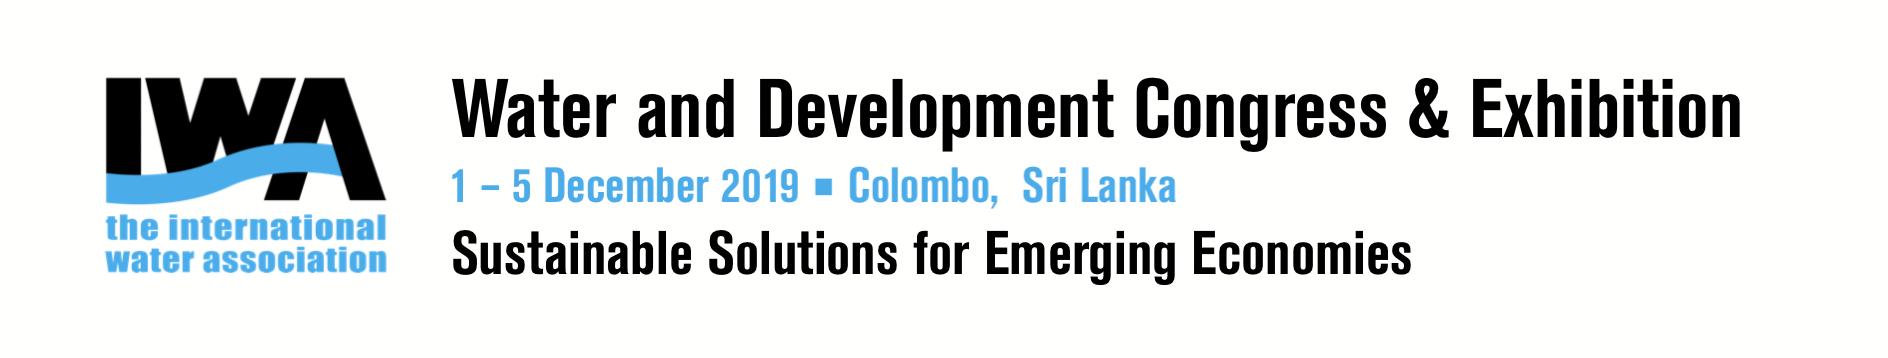 IWA Water and Development Congress & Exhibition banner